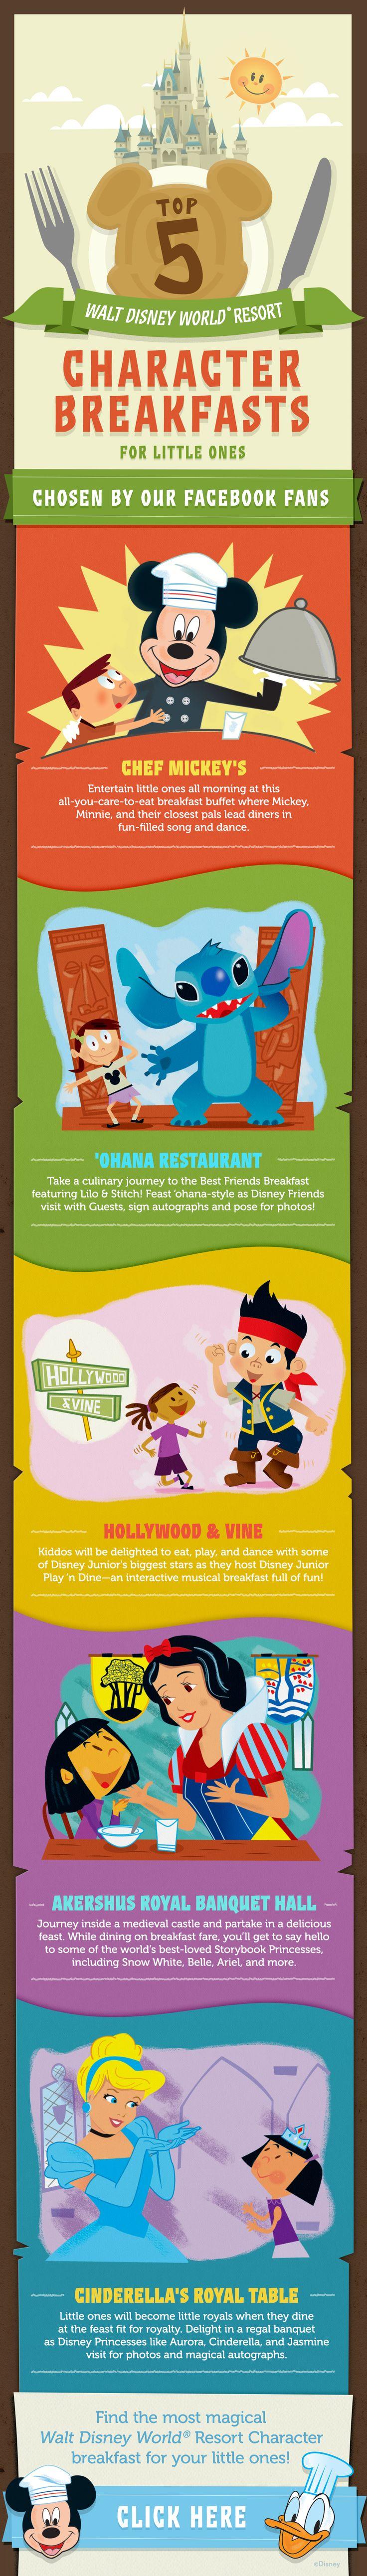 Top 5 Character Breakfasts for little ones at Walt Disney World! Let's start planning your Magical Walt Disney World getaway today! donnakay@thewdwguru.com